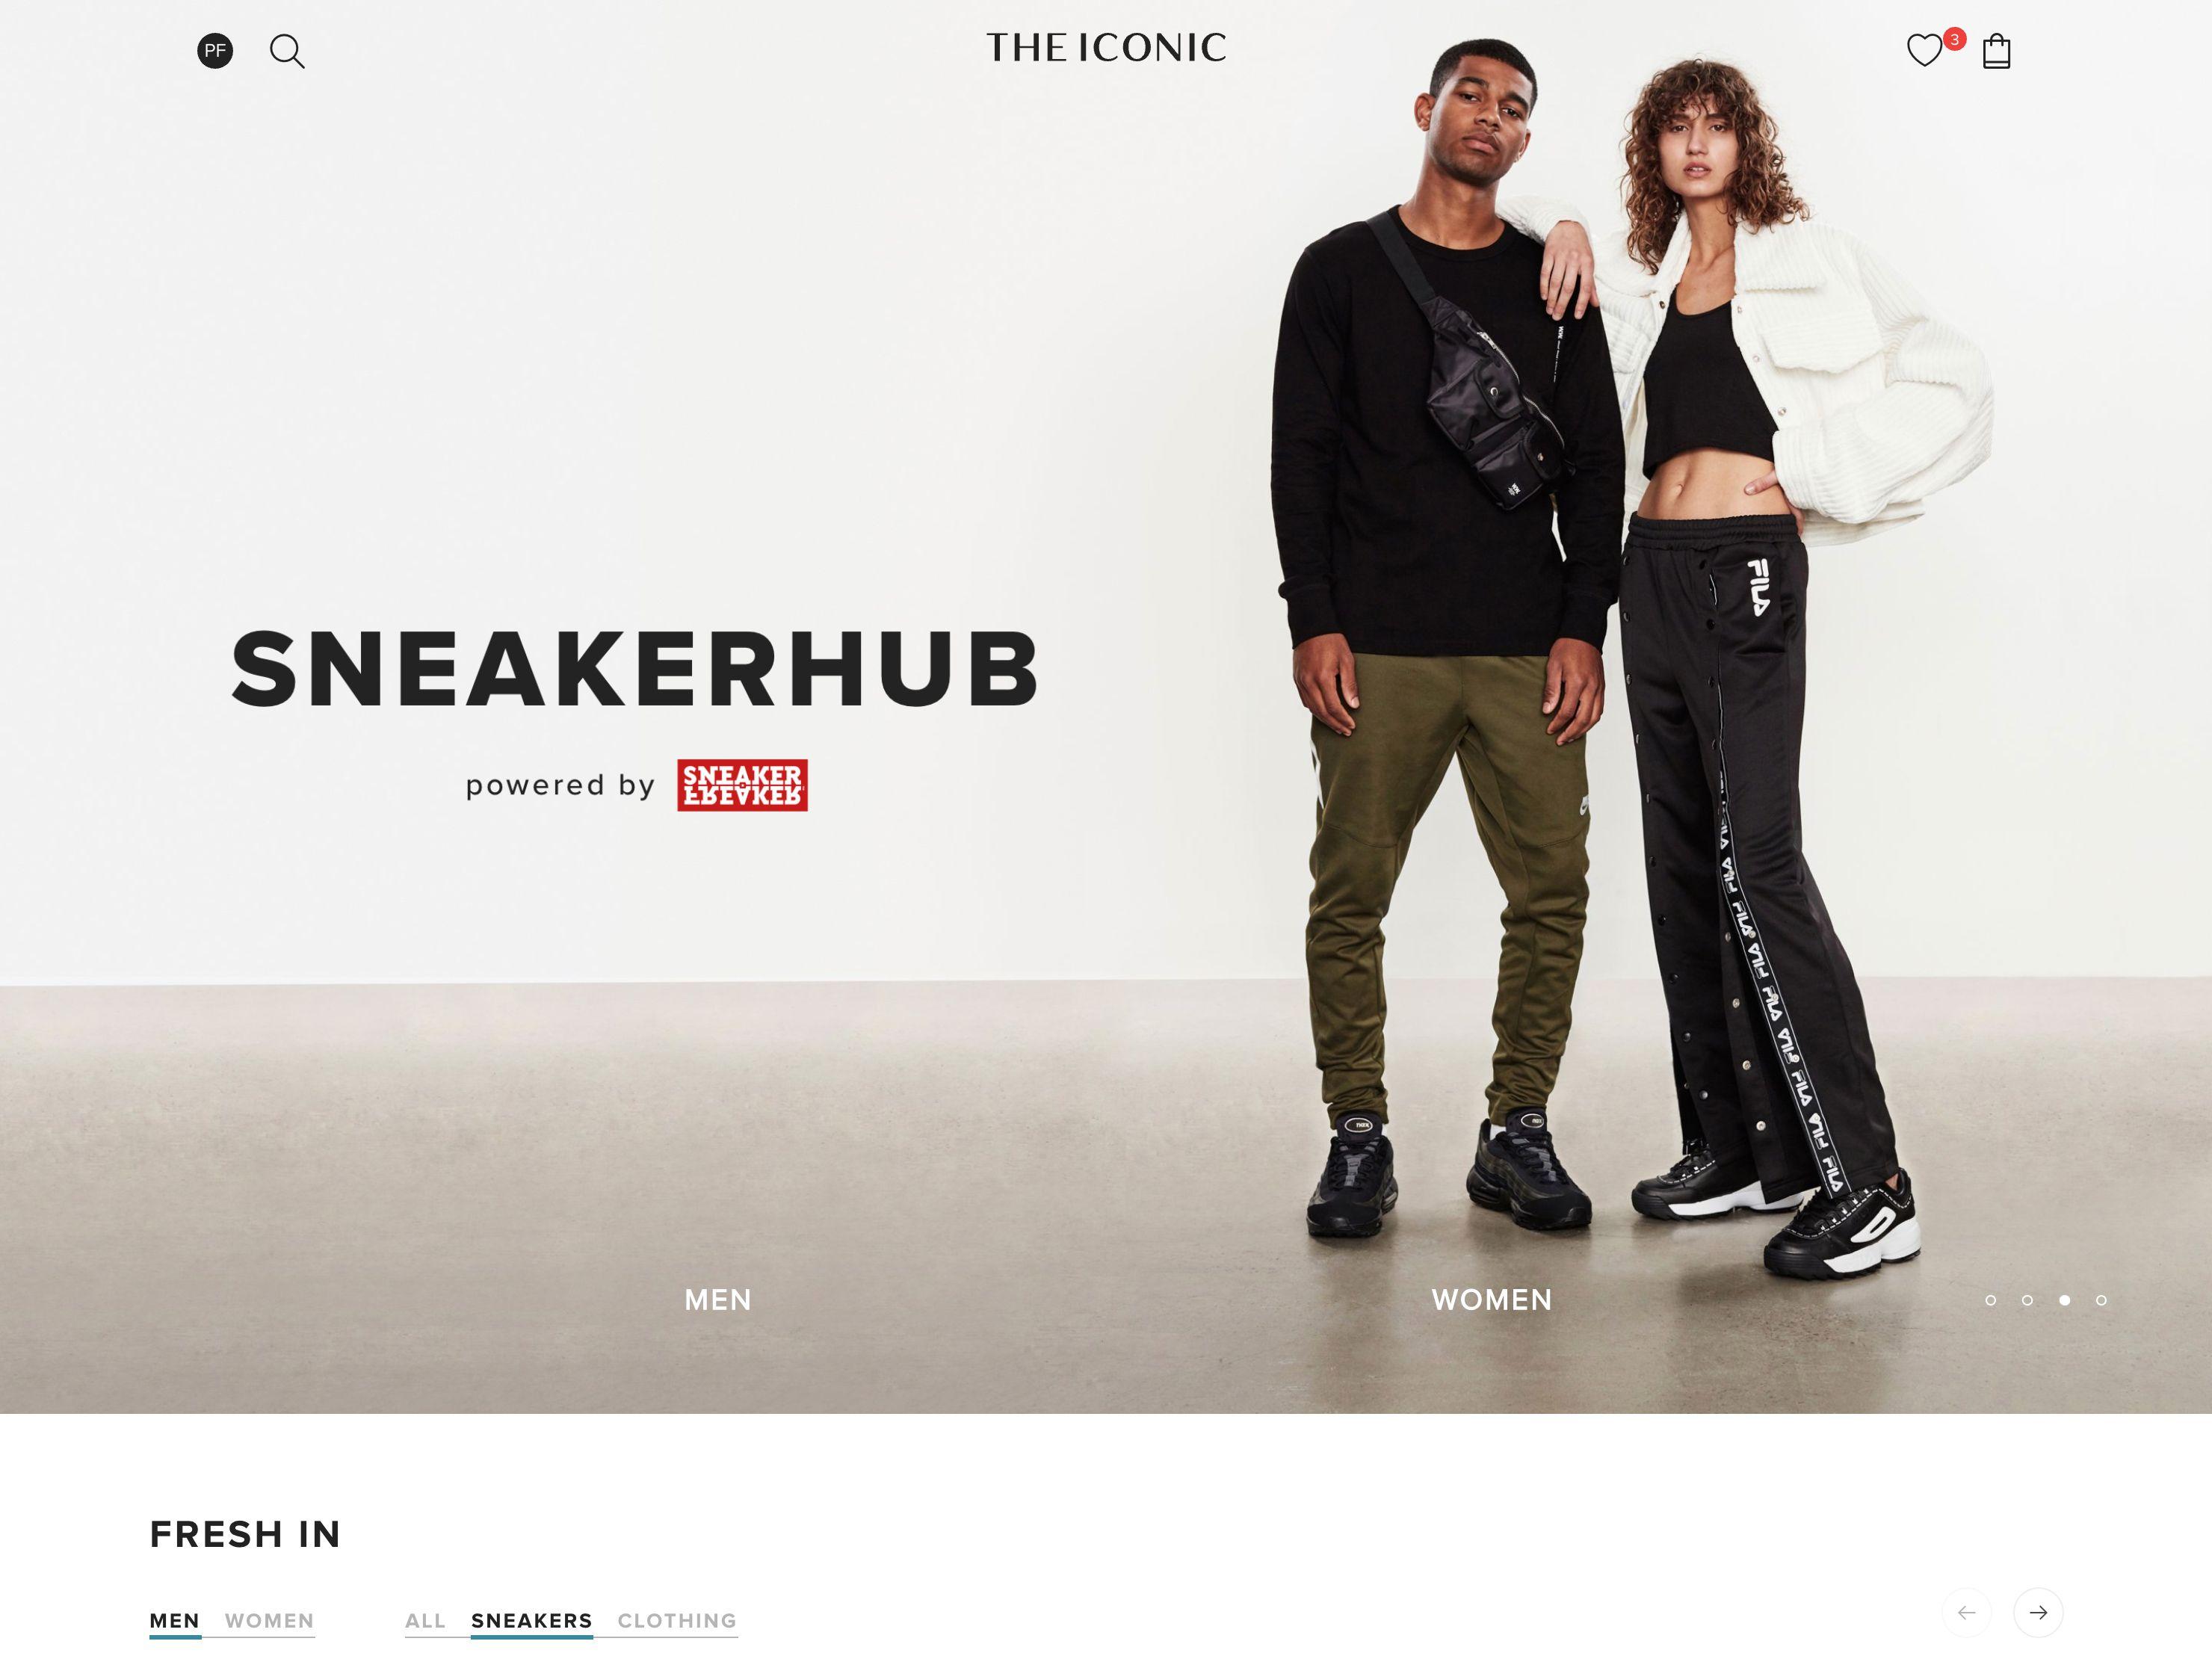 Screenshot of THE ICONIC's SneakerHub landing page